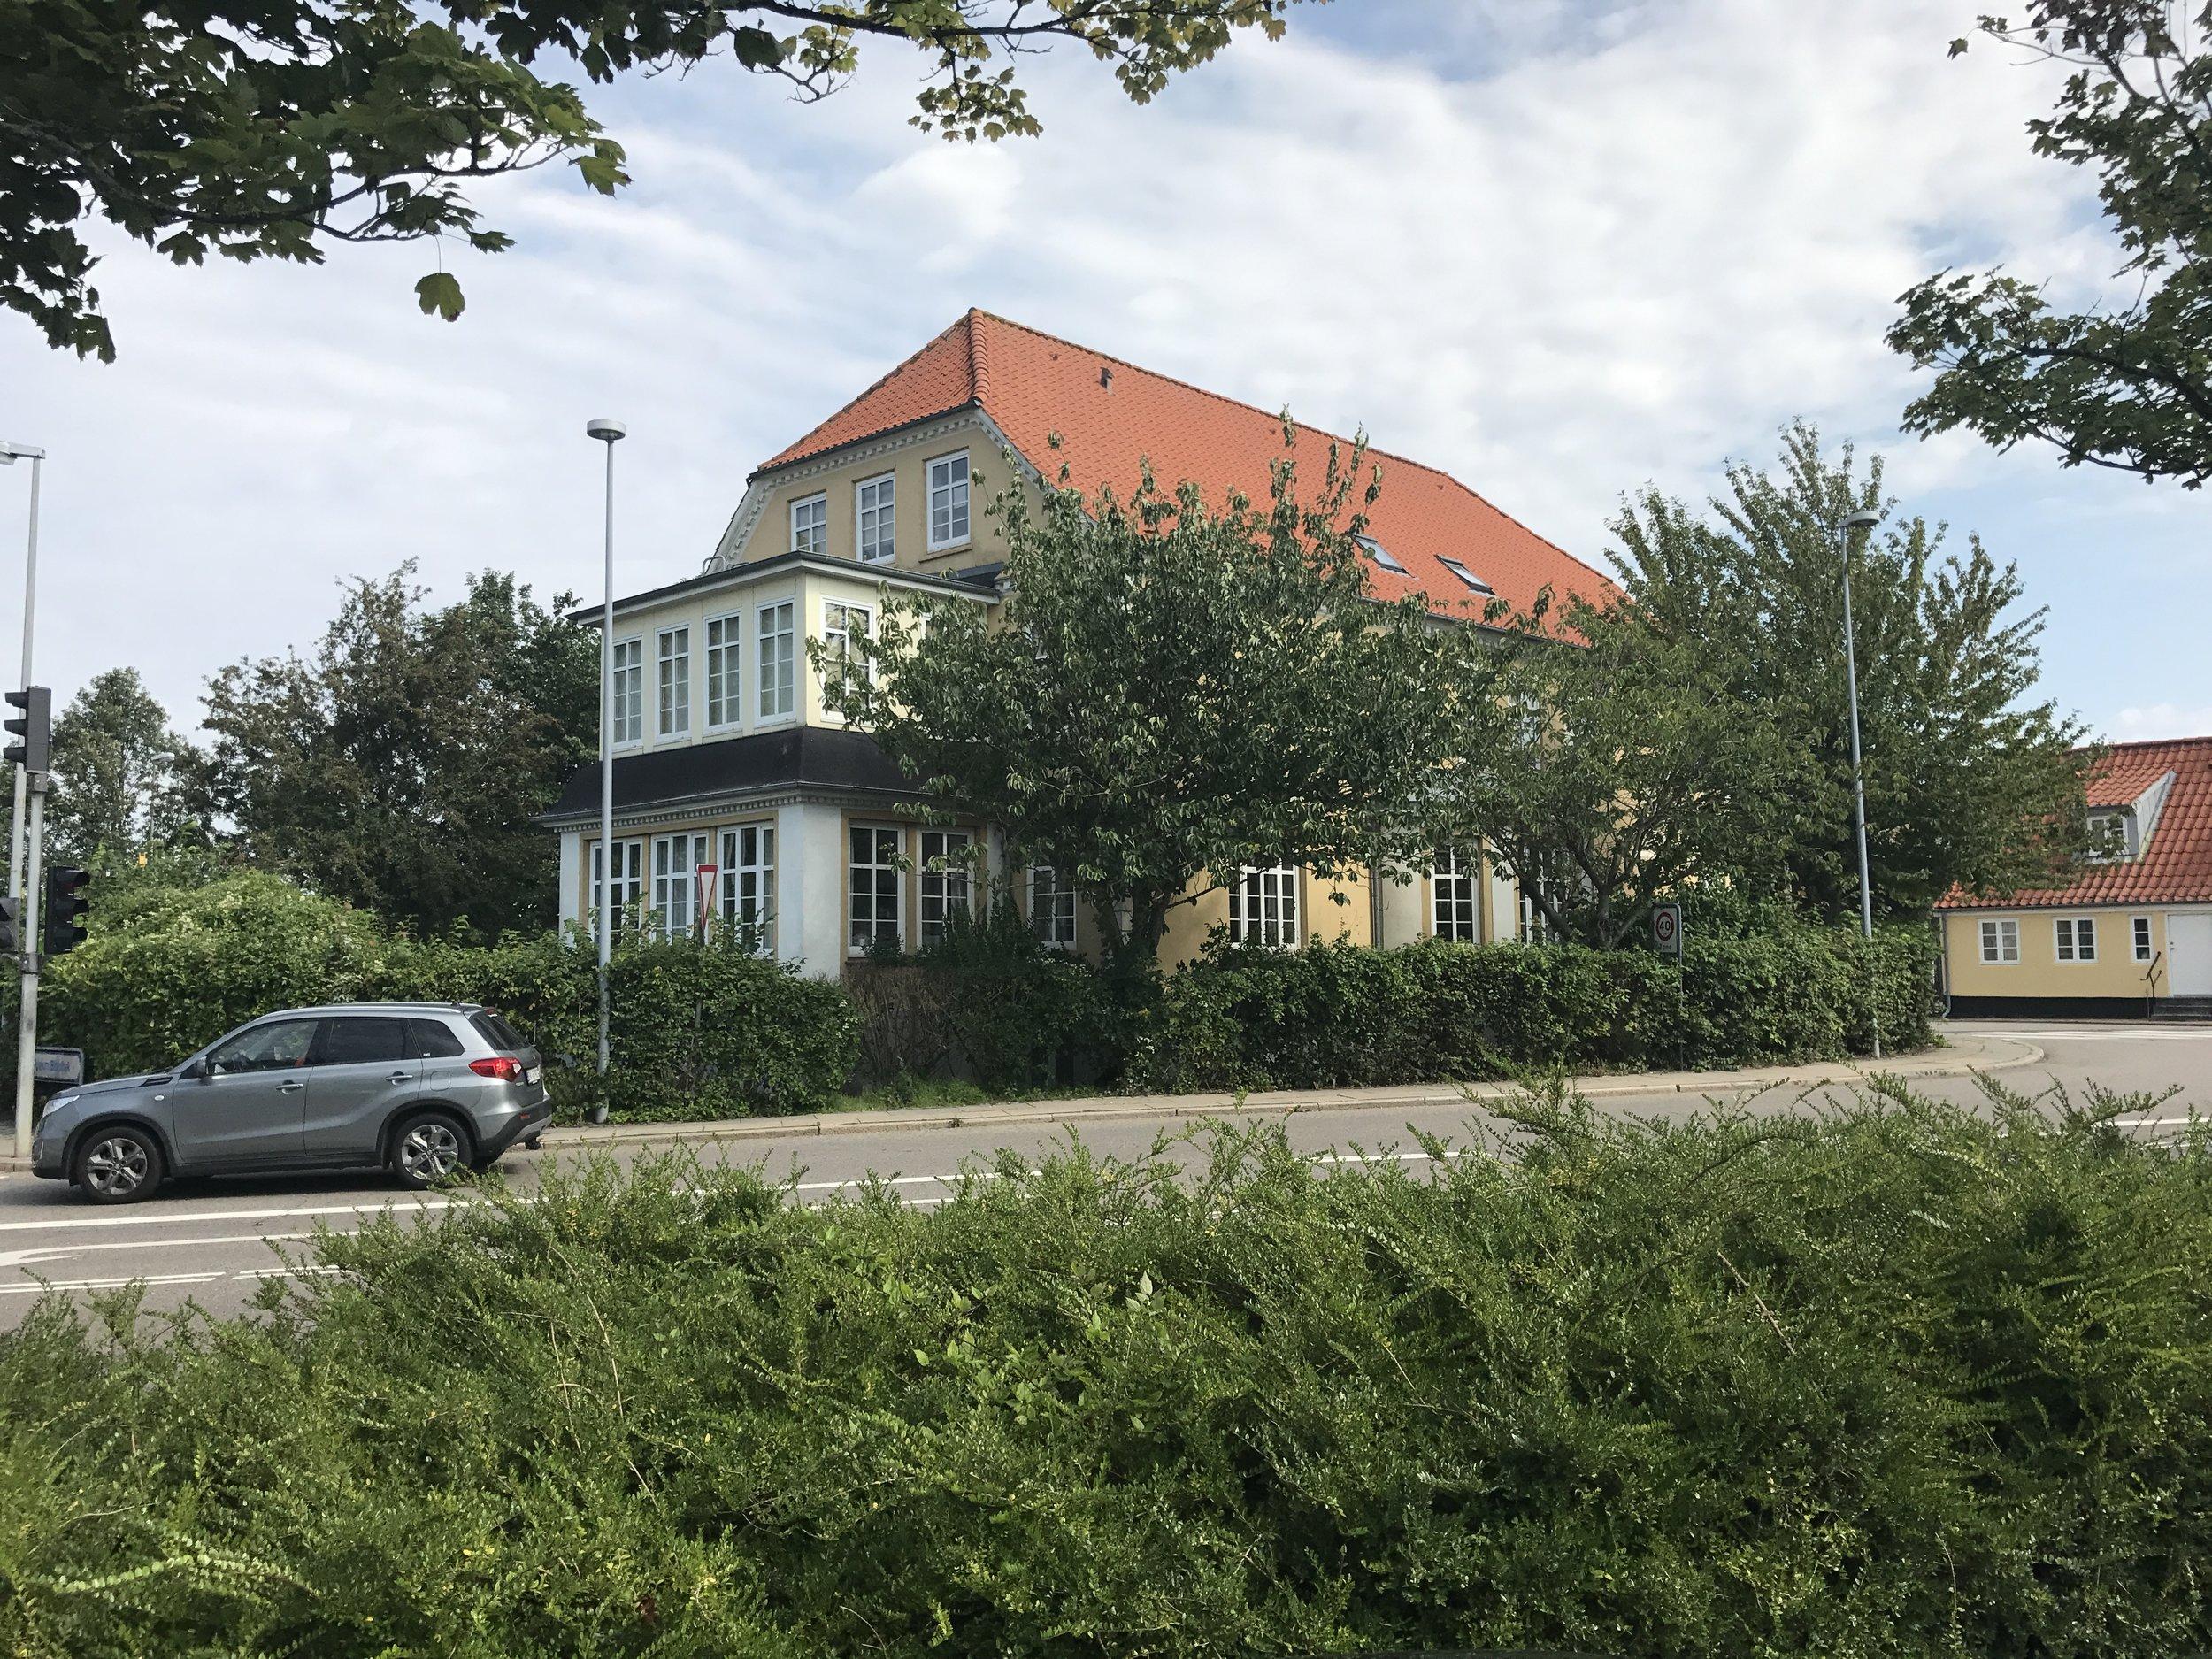 MECO_Architects_Museum-Soenderborg_01.JPG